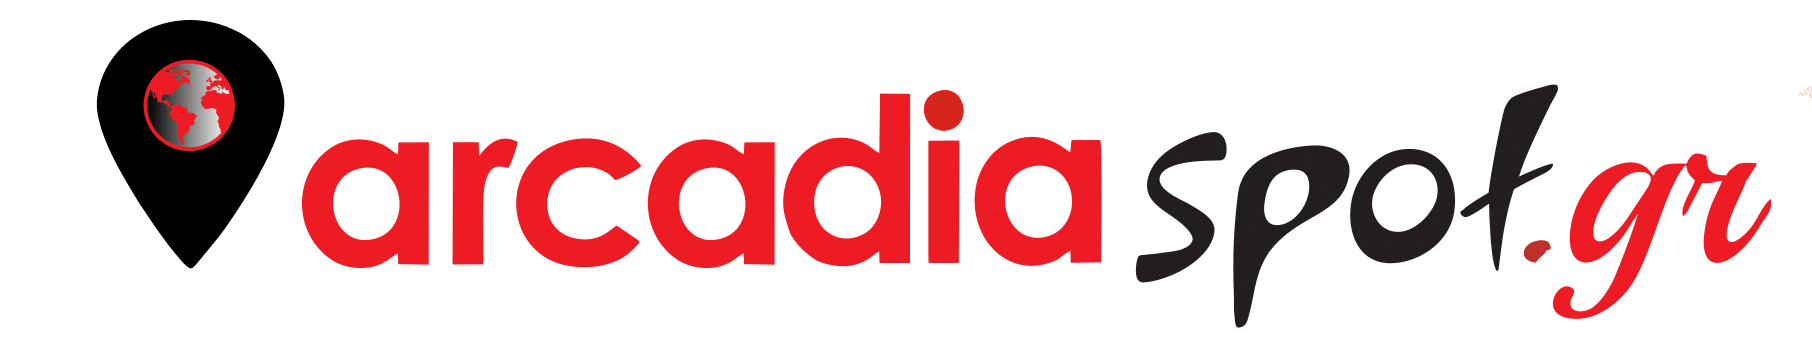 Arcadia SPOT